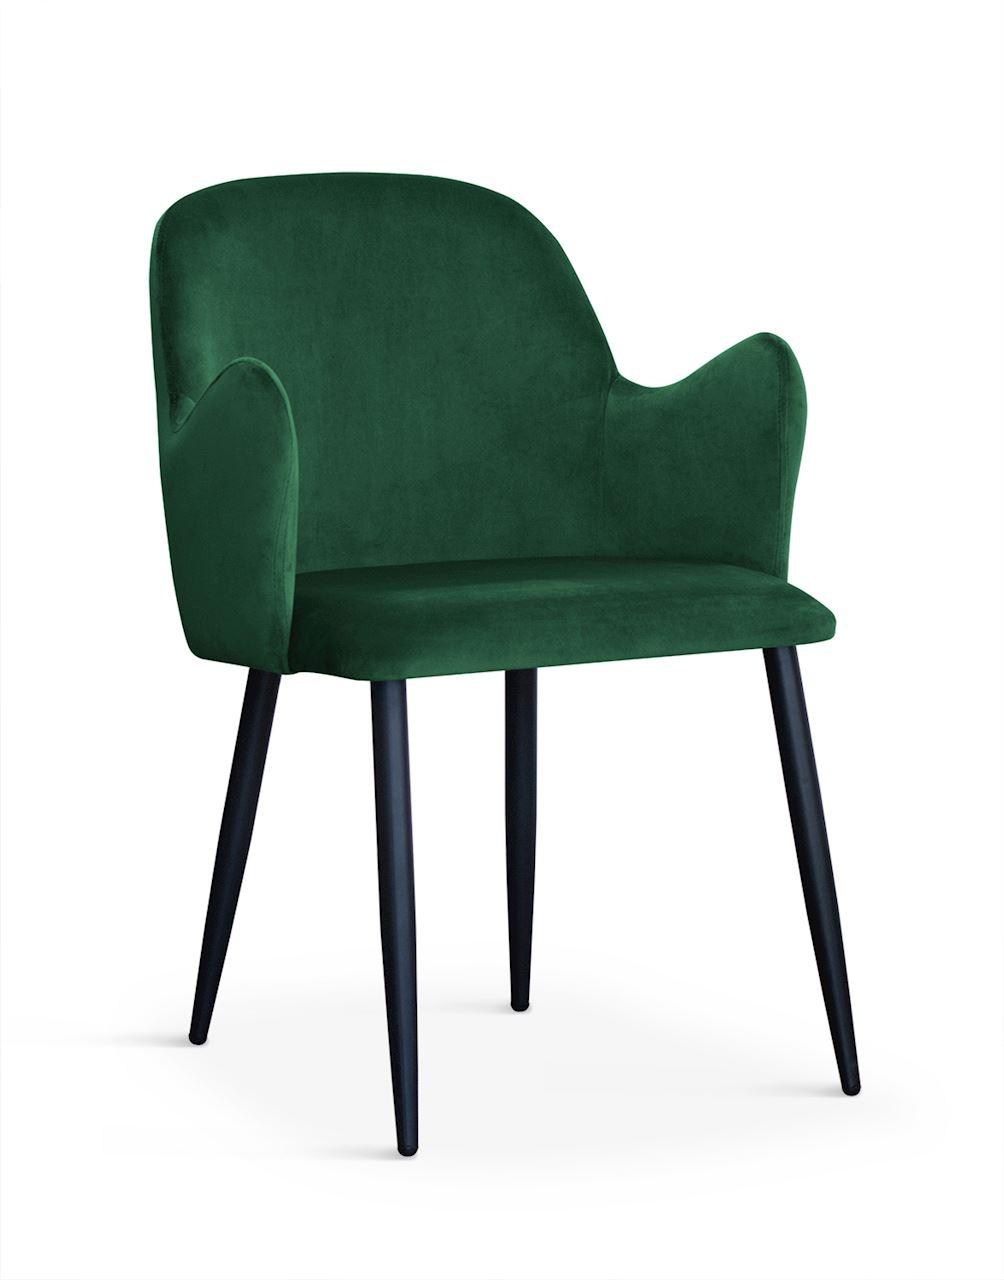 Scaun tapitat cu stofa, cu picioare metalice Camel Green / Black, l58xA63xH84 cm